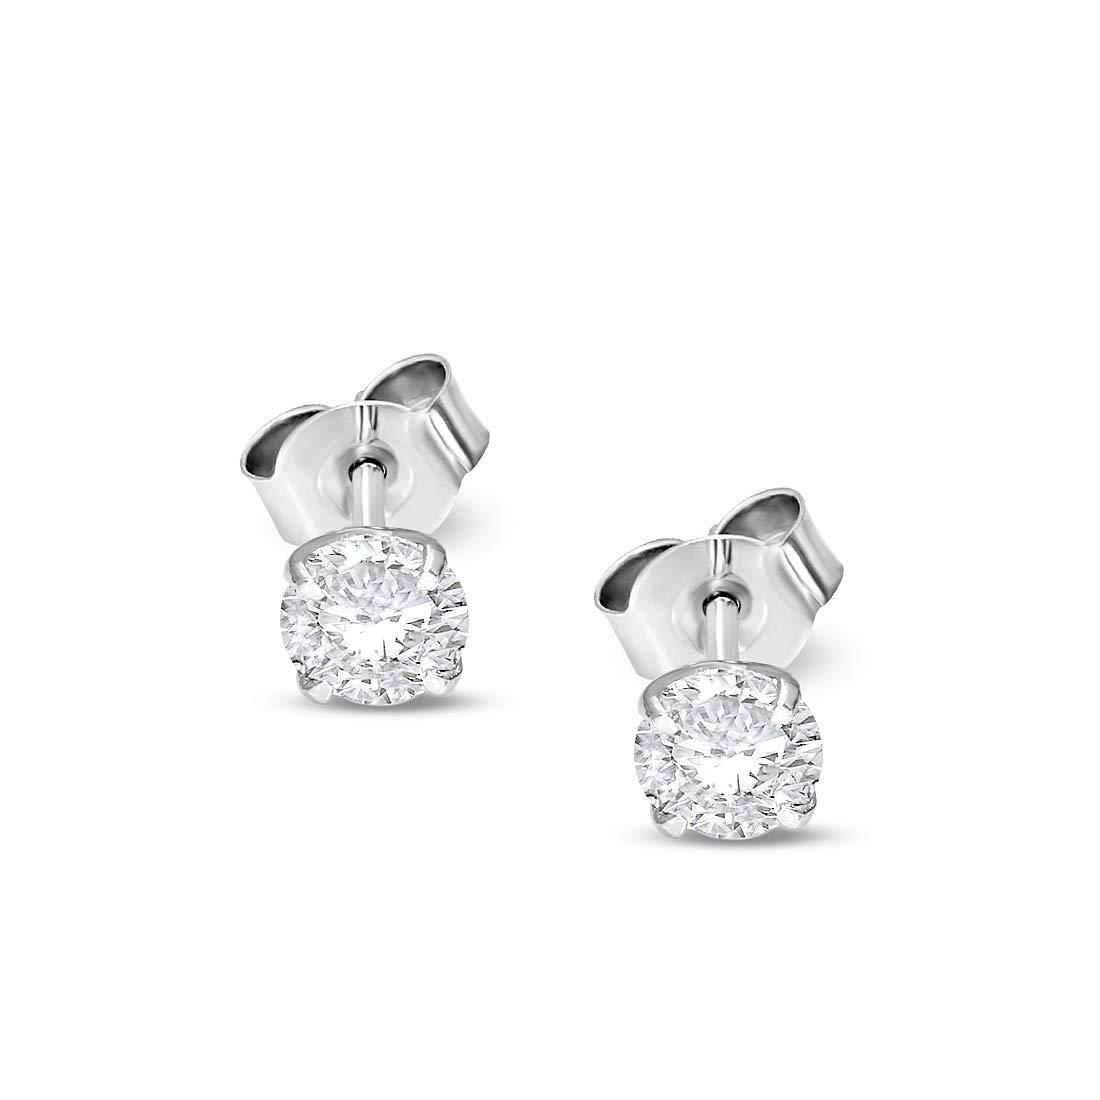 bef0dbb4e Amazon.com: Luxury 1 cttw Lab Grown Diamond Stud Earrings Lab Created Diamond  Earrings SI-GH Quality 10K Real Diamond Earrings White Gold Diamond Jewelry  ...